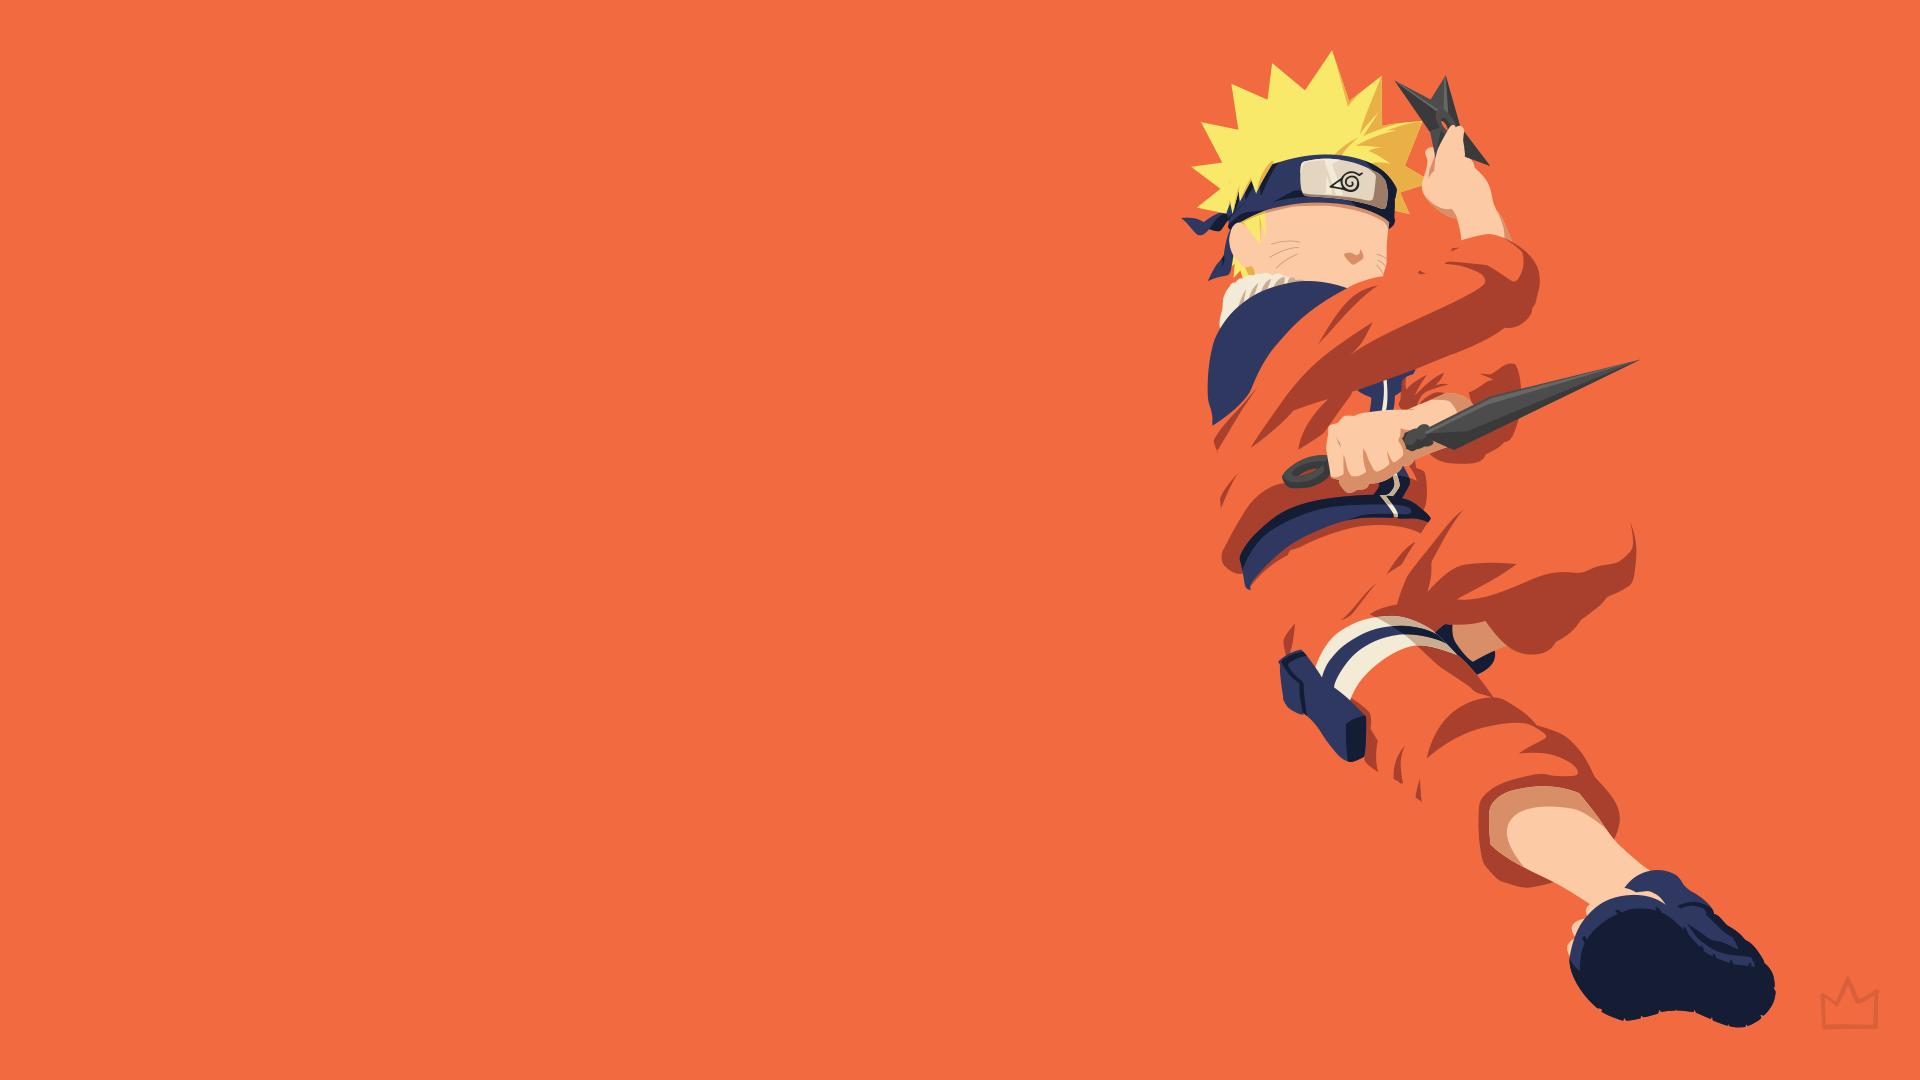 Amazing Wallpaper Naruto Minimalistic - 21dd974eee84df11e97110fea0d5ed42  Collection_4202.png